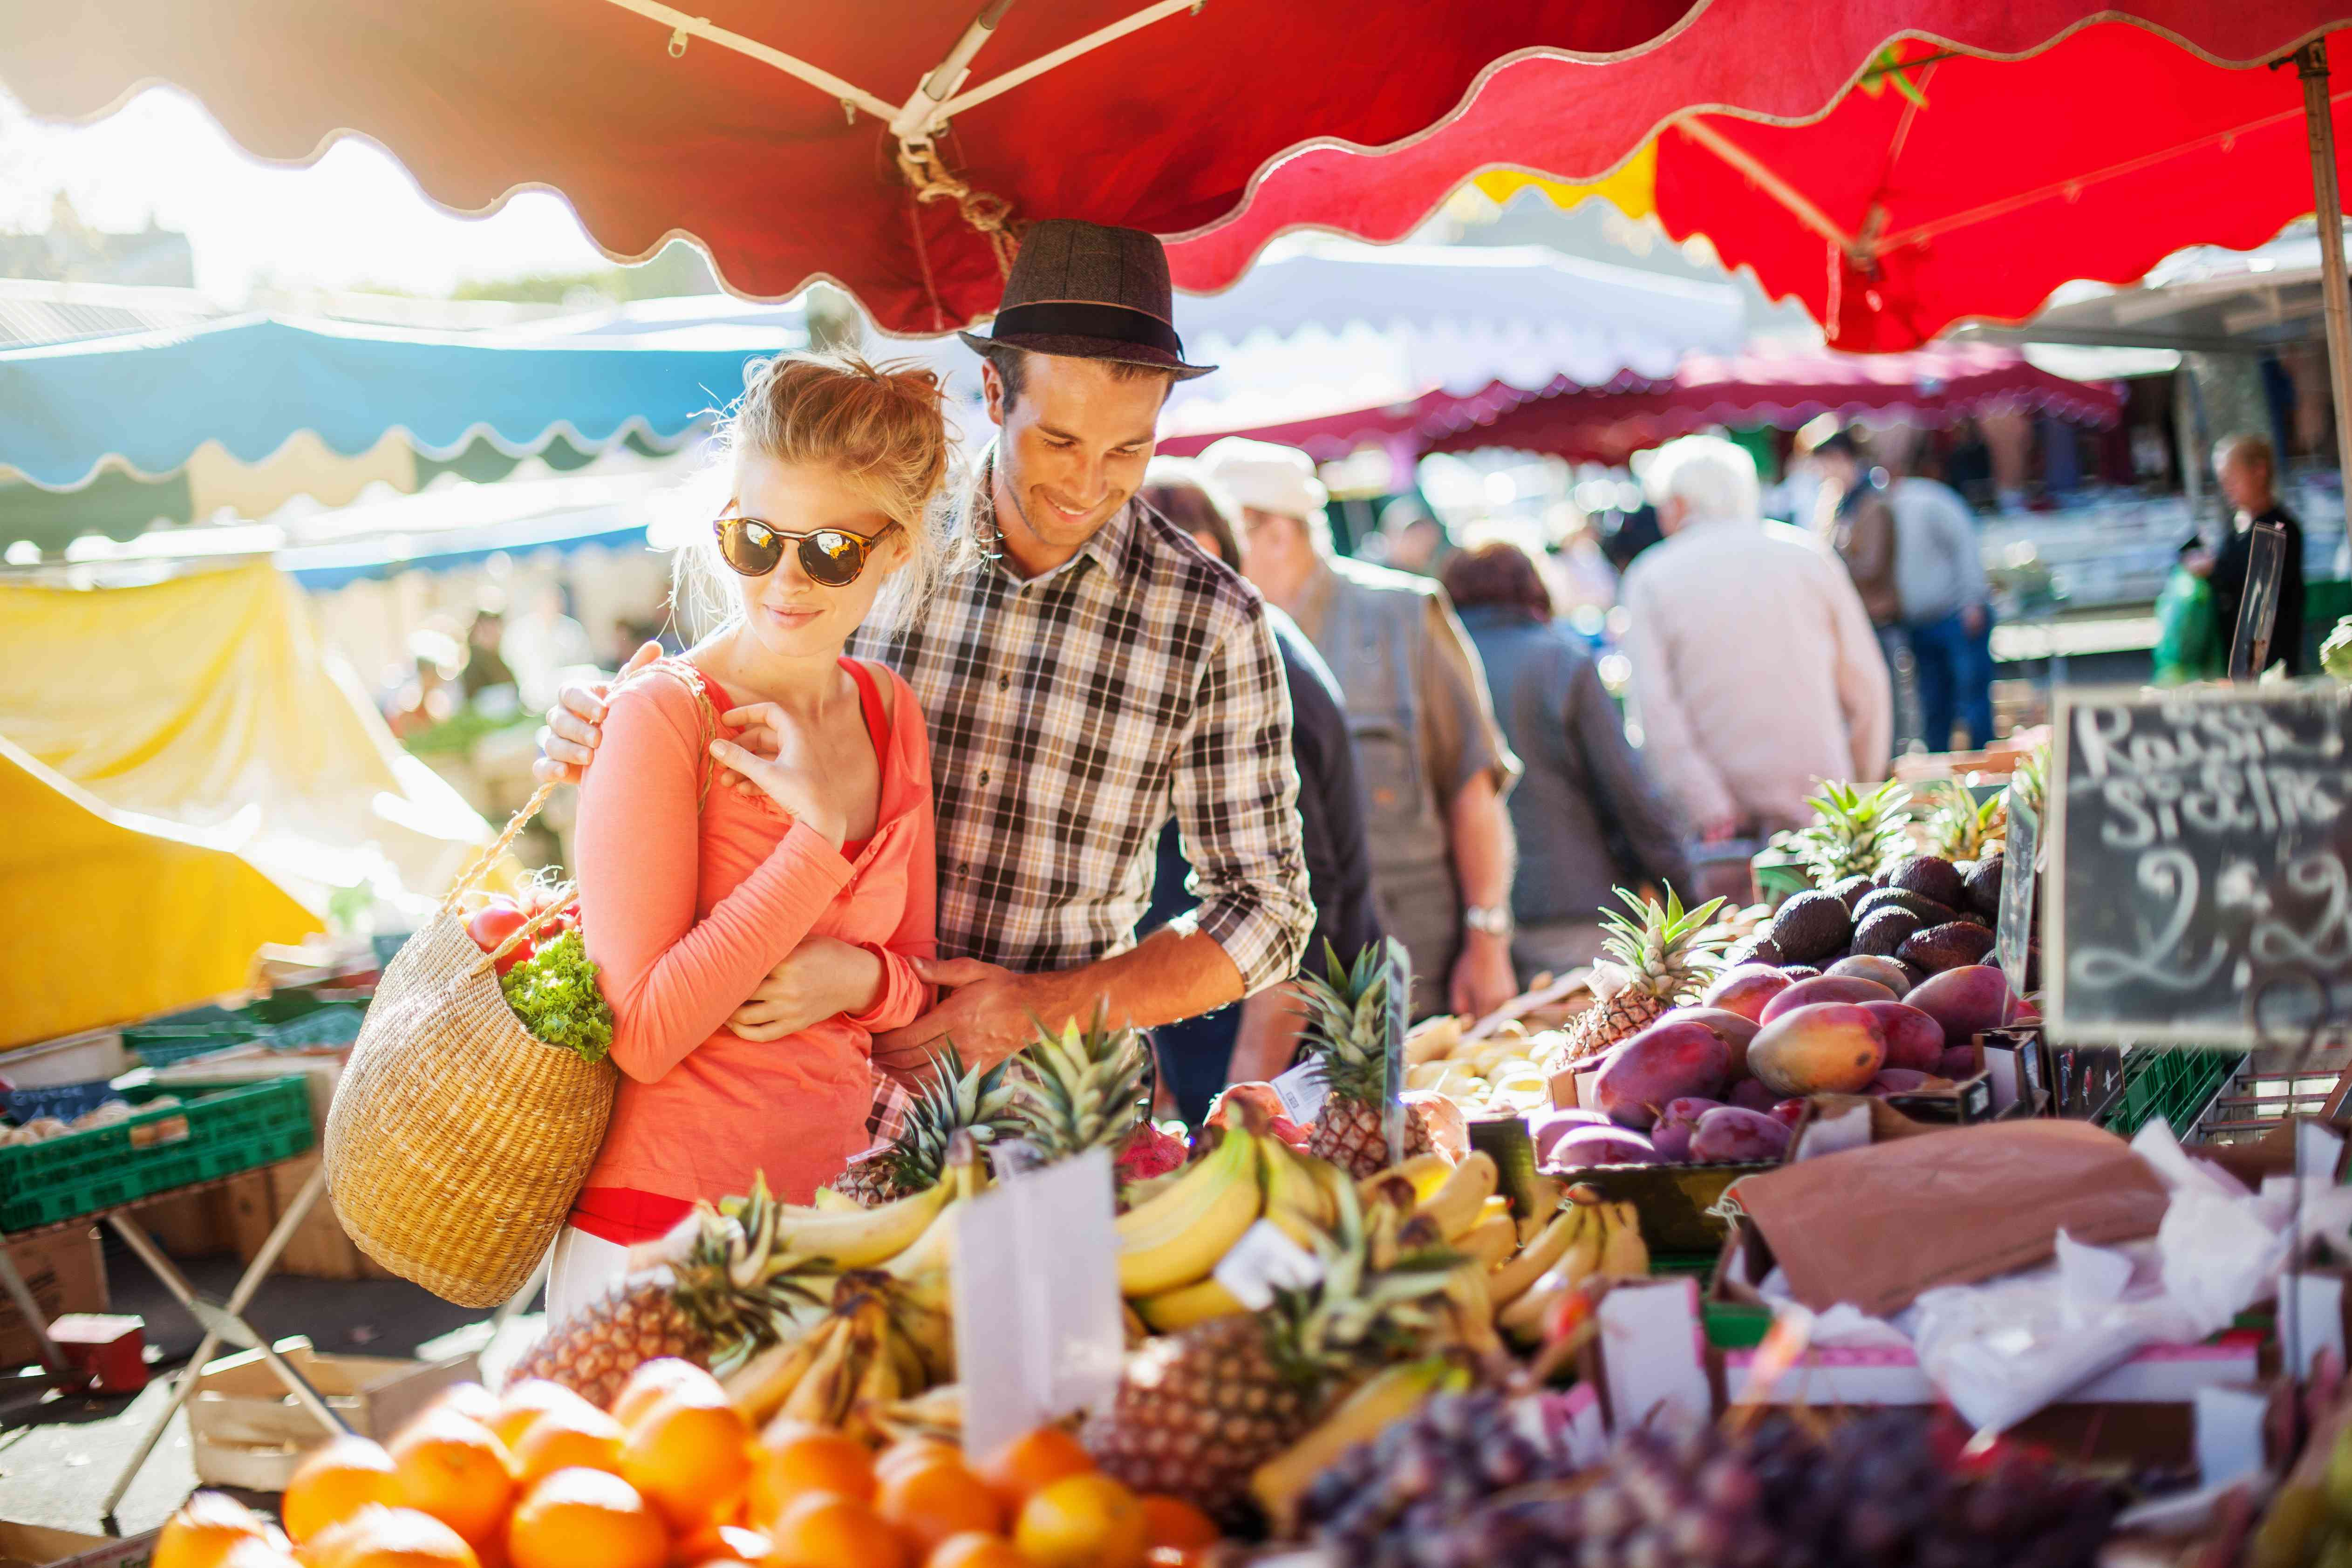 A couple shops at a farmers market